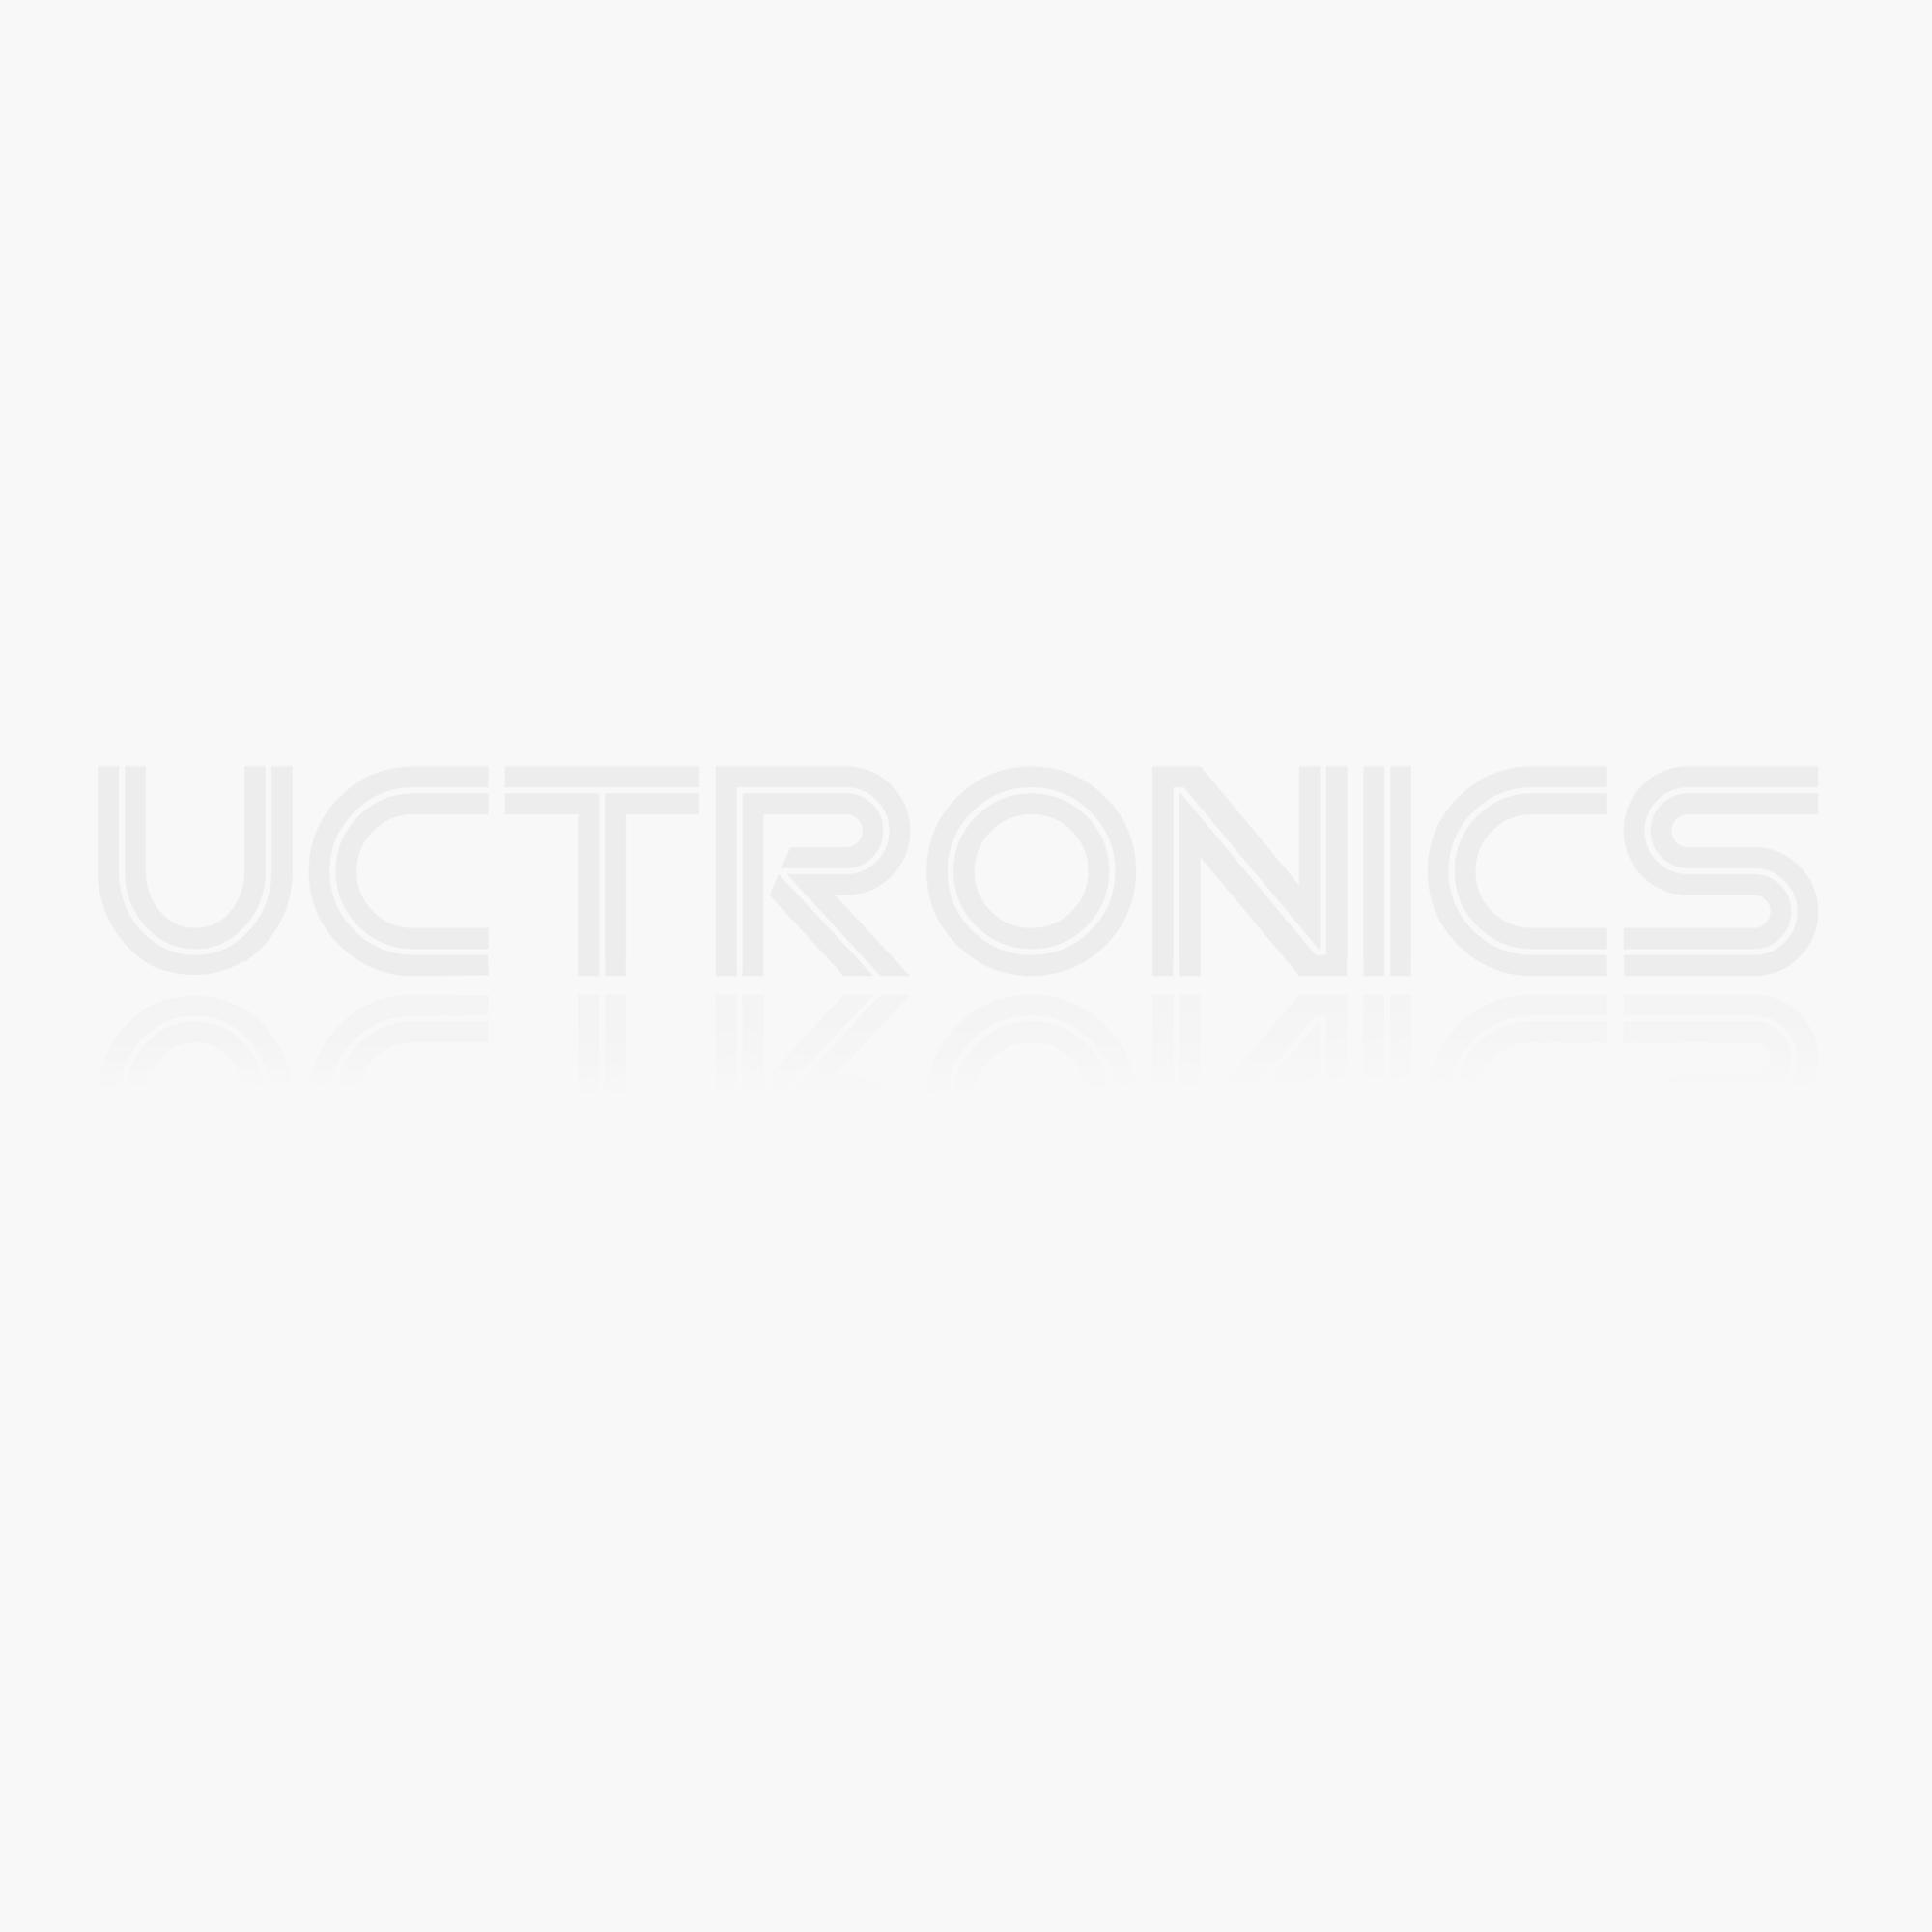 10pcs 3.5*4.5cm Sponge for Soldering Iron Tip Cleaning Cleaner